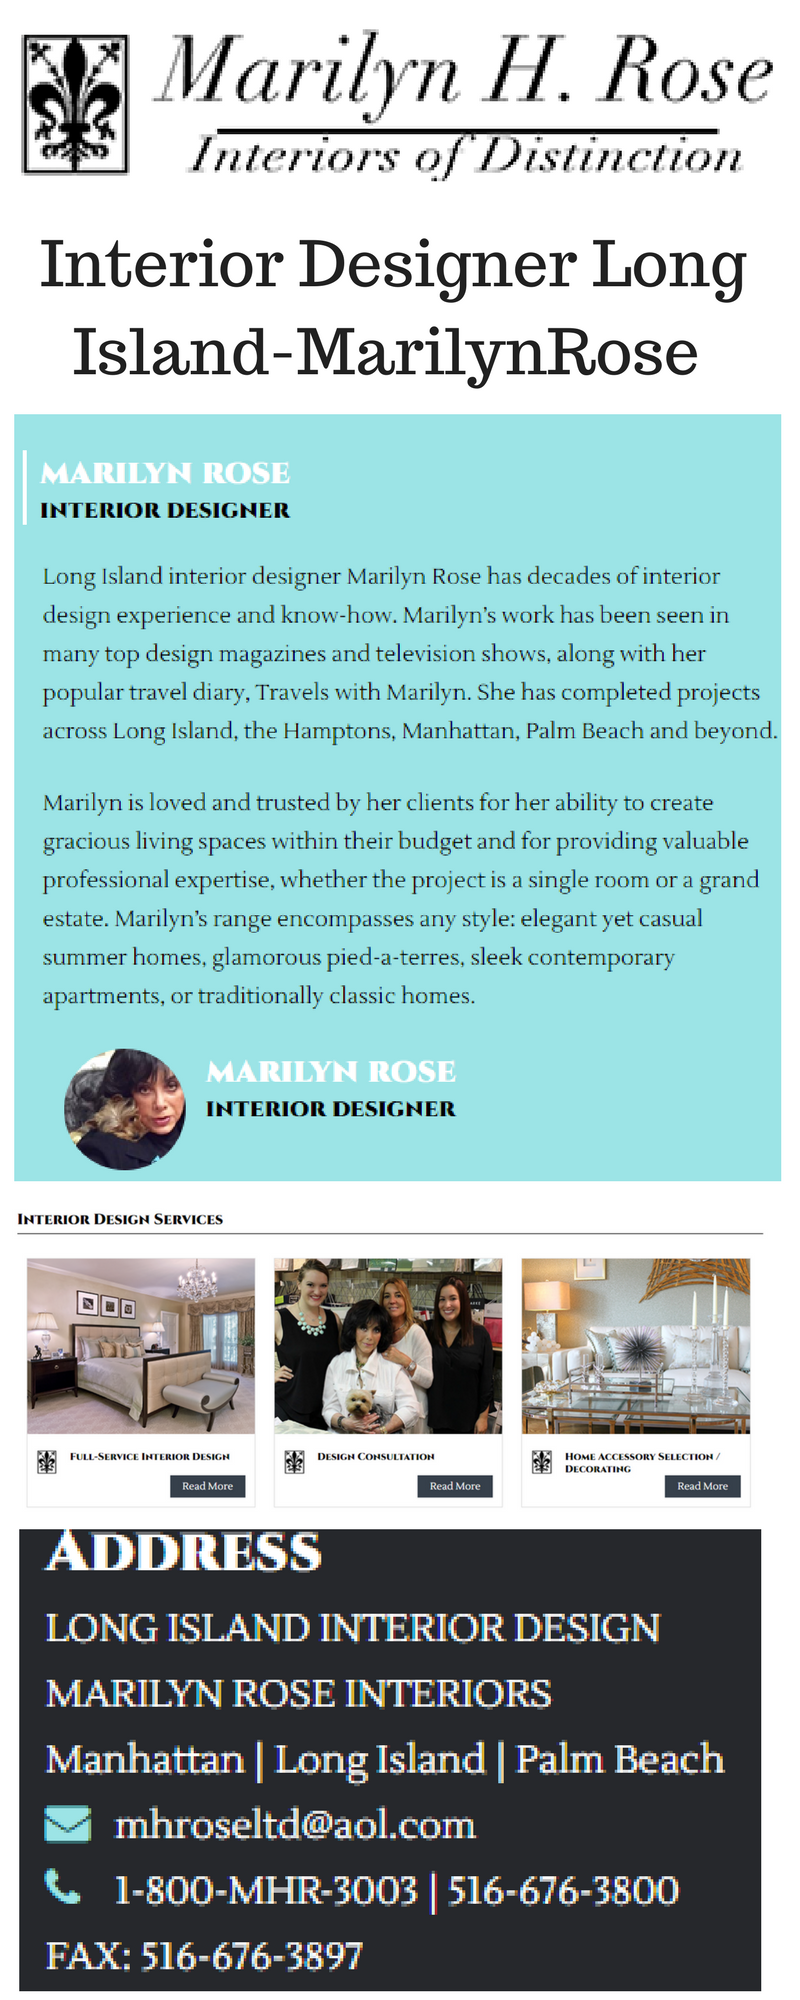 interior design long island marilynrose by marilynroseny on deviantart